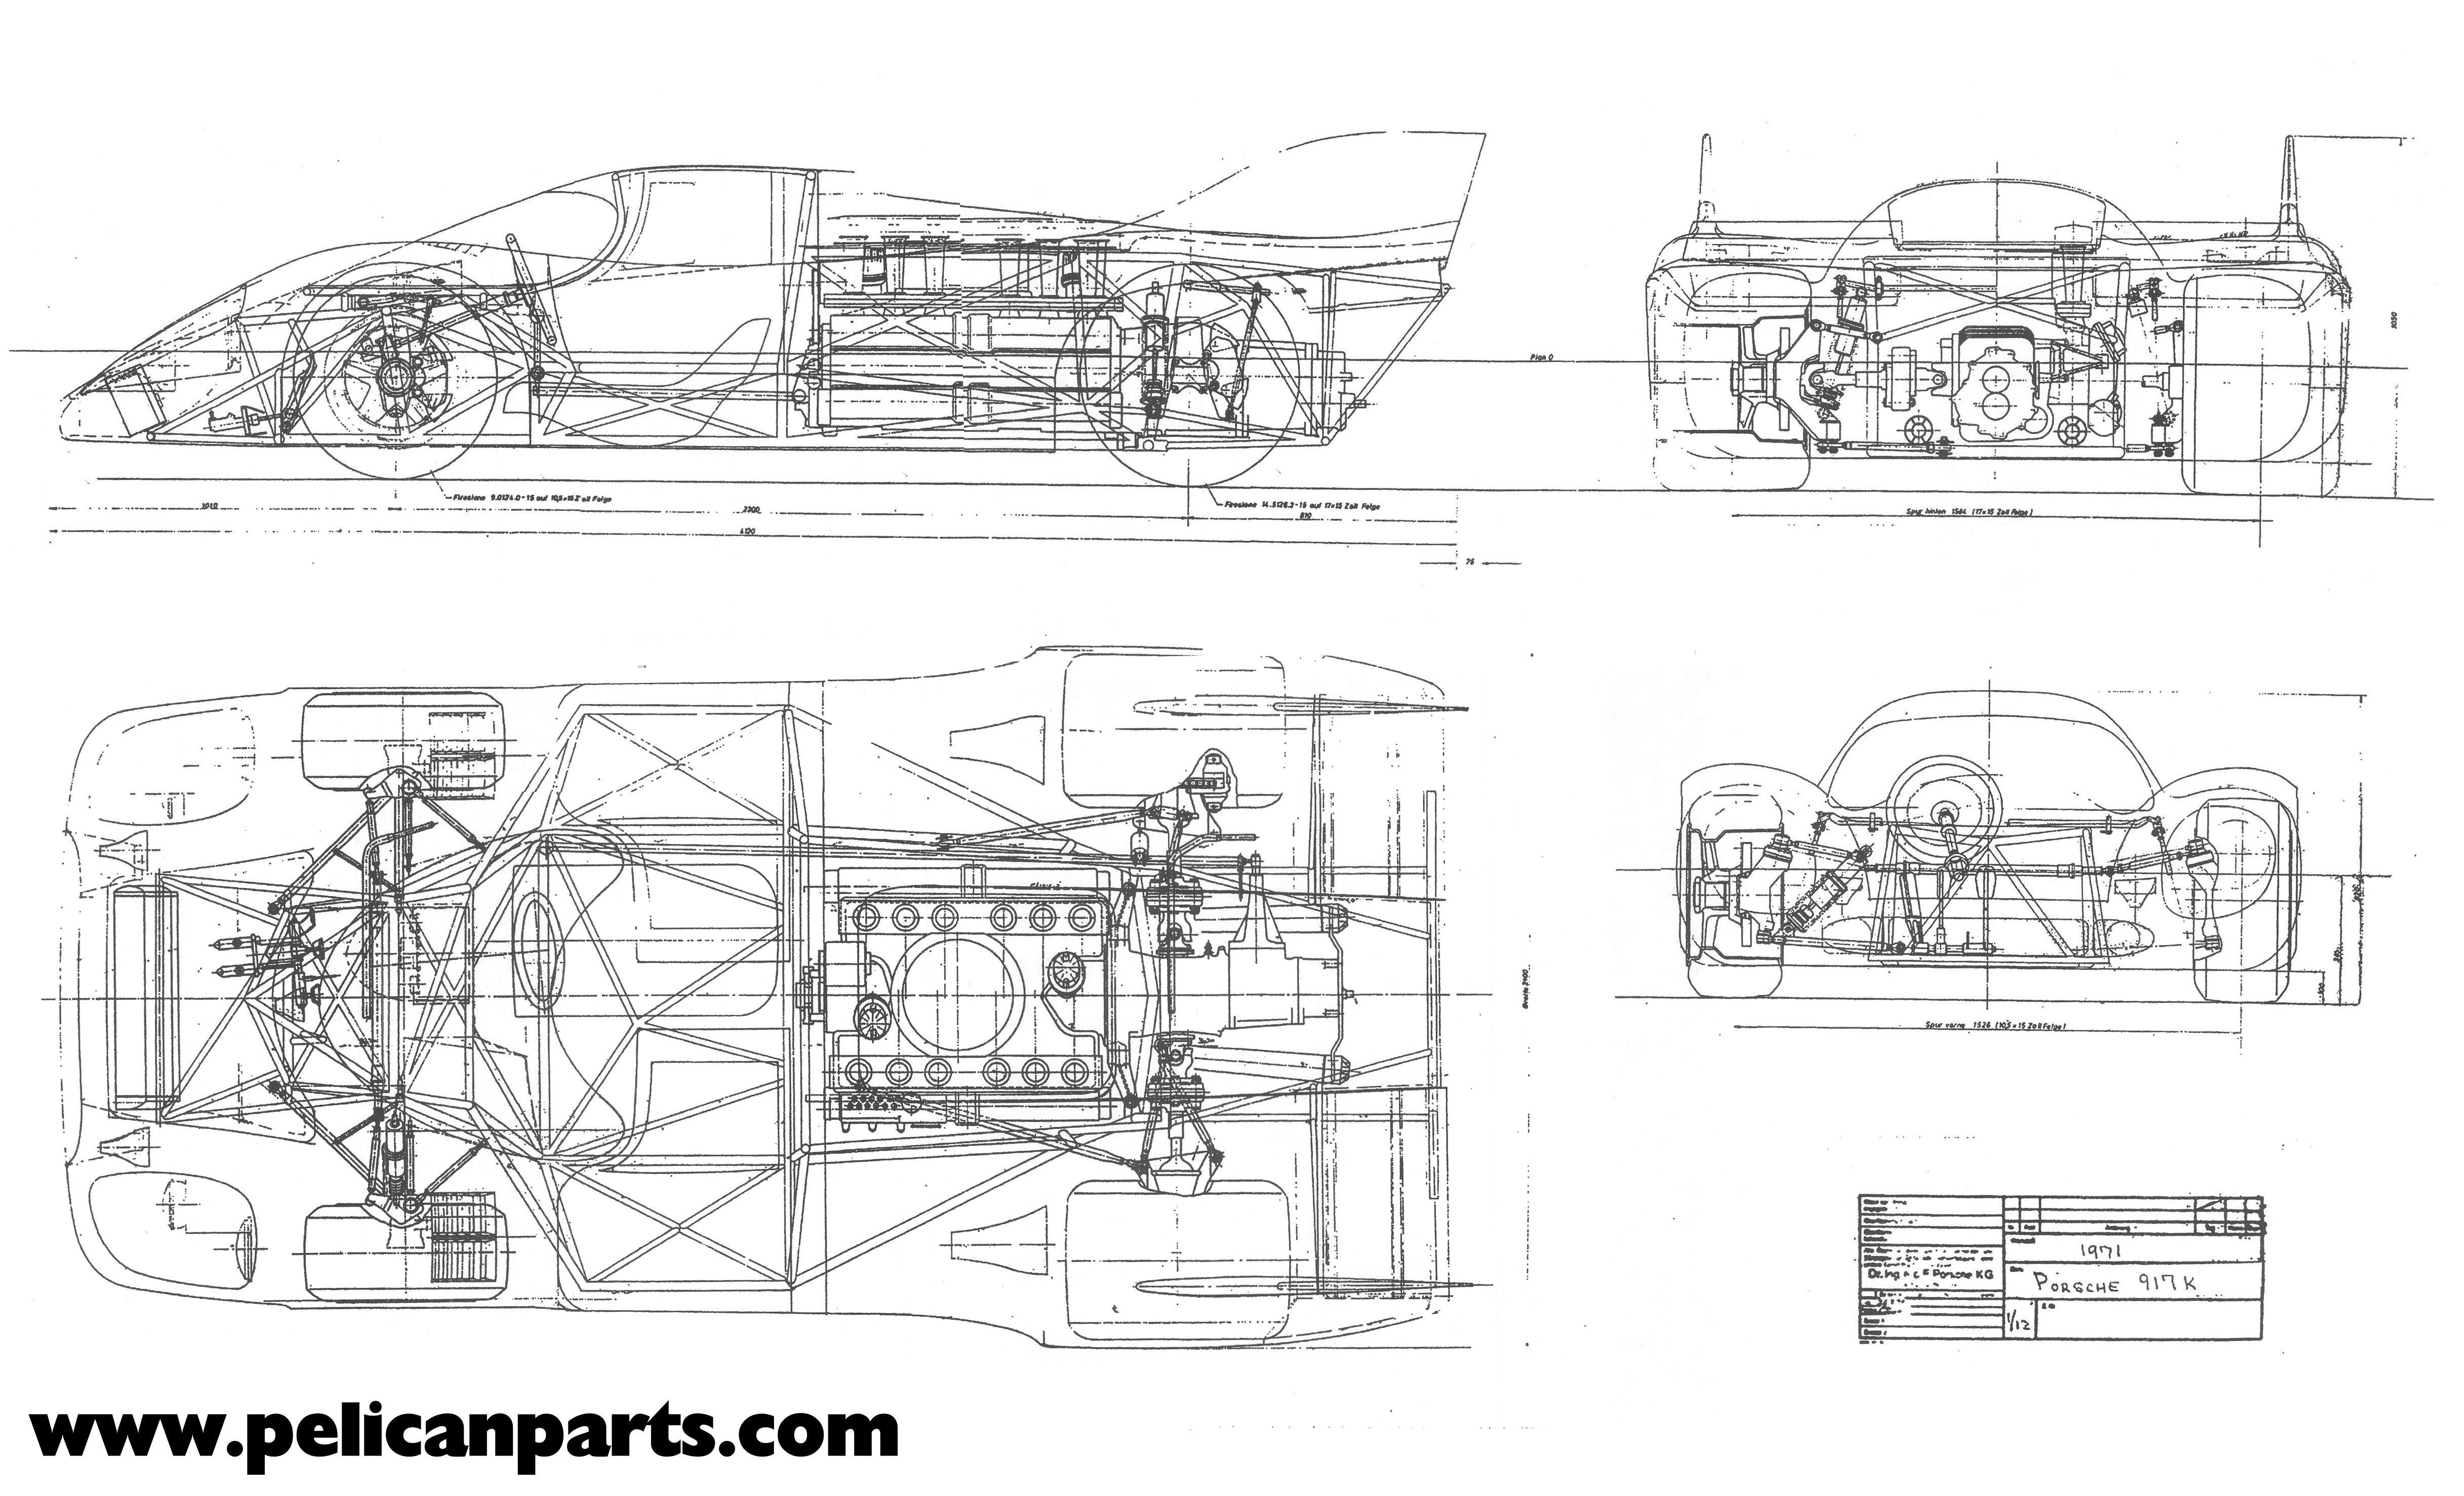 917k hugeg 48672955 blueprints pinterest cars cars malvernweather Choice Image